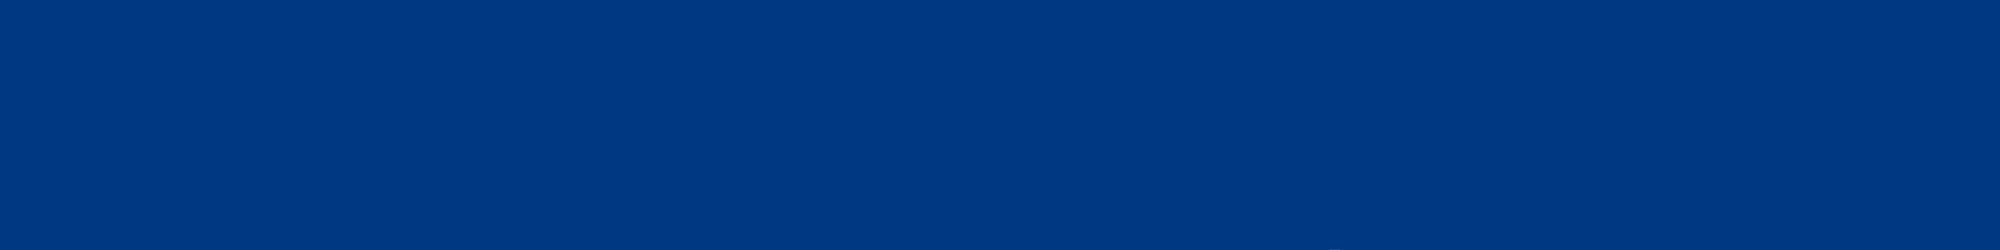 blue-banner